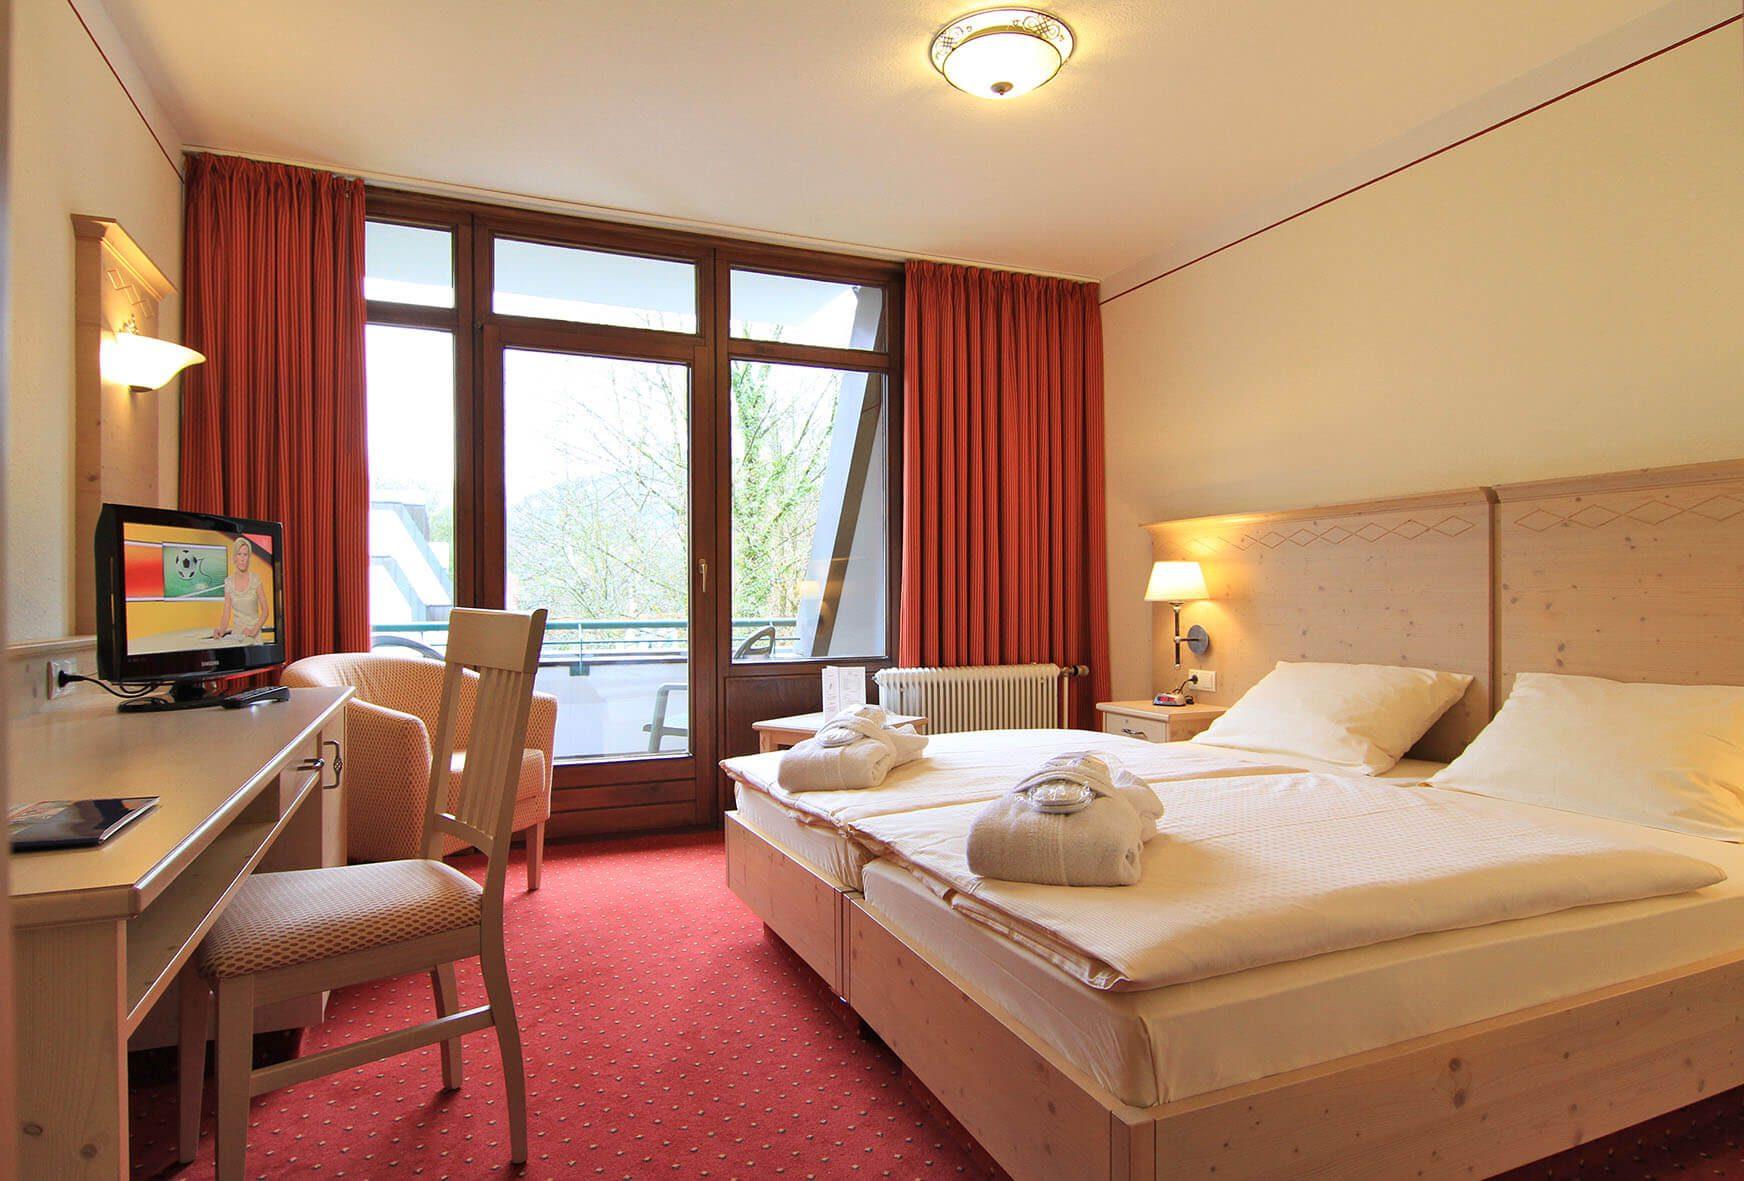 AMBER HOTEL BAVARIA - Landhauszimmer